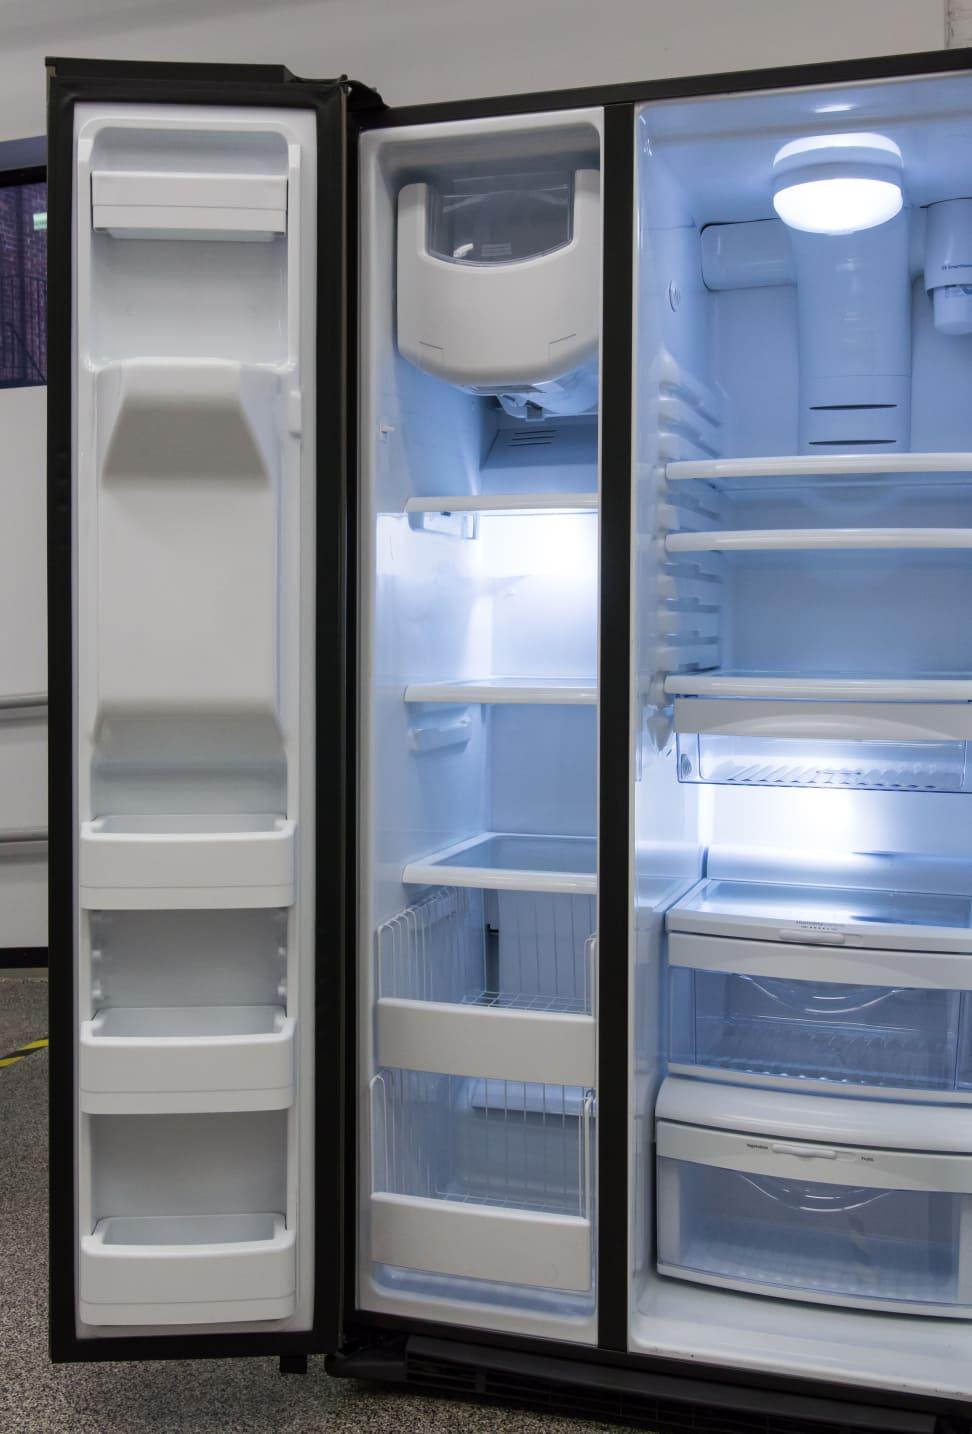 GE-GSE25HMHES_freezer-highlight